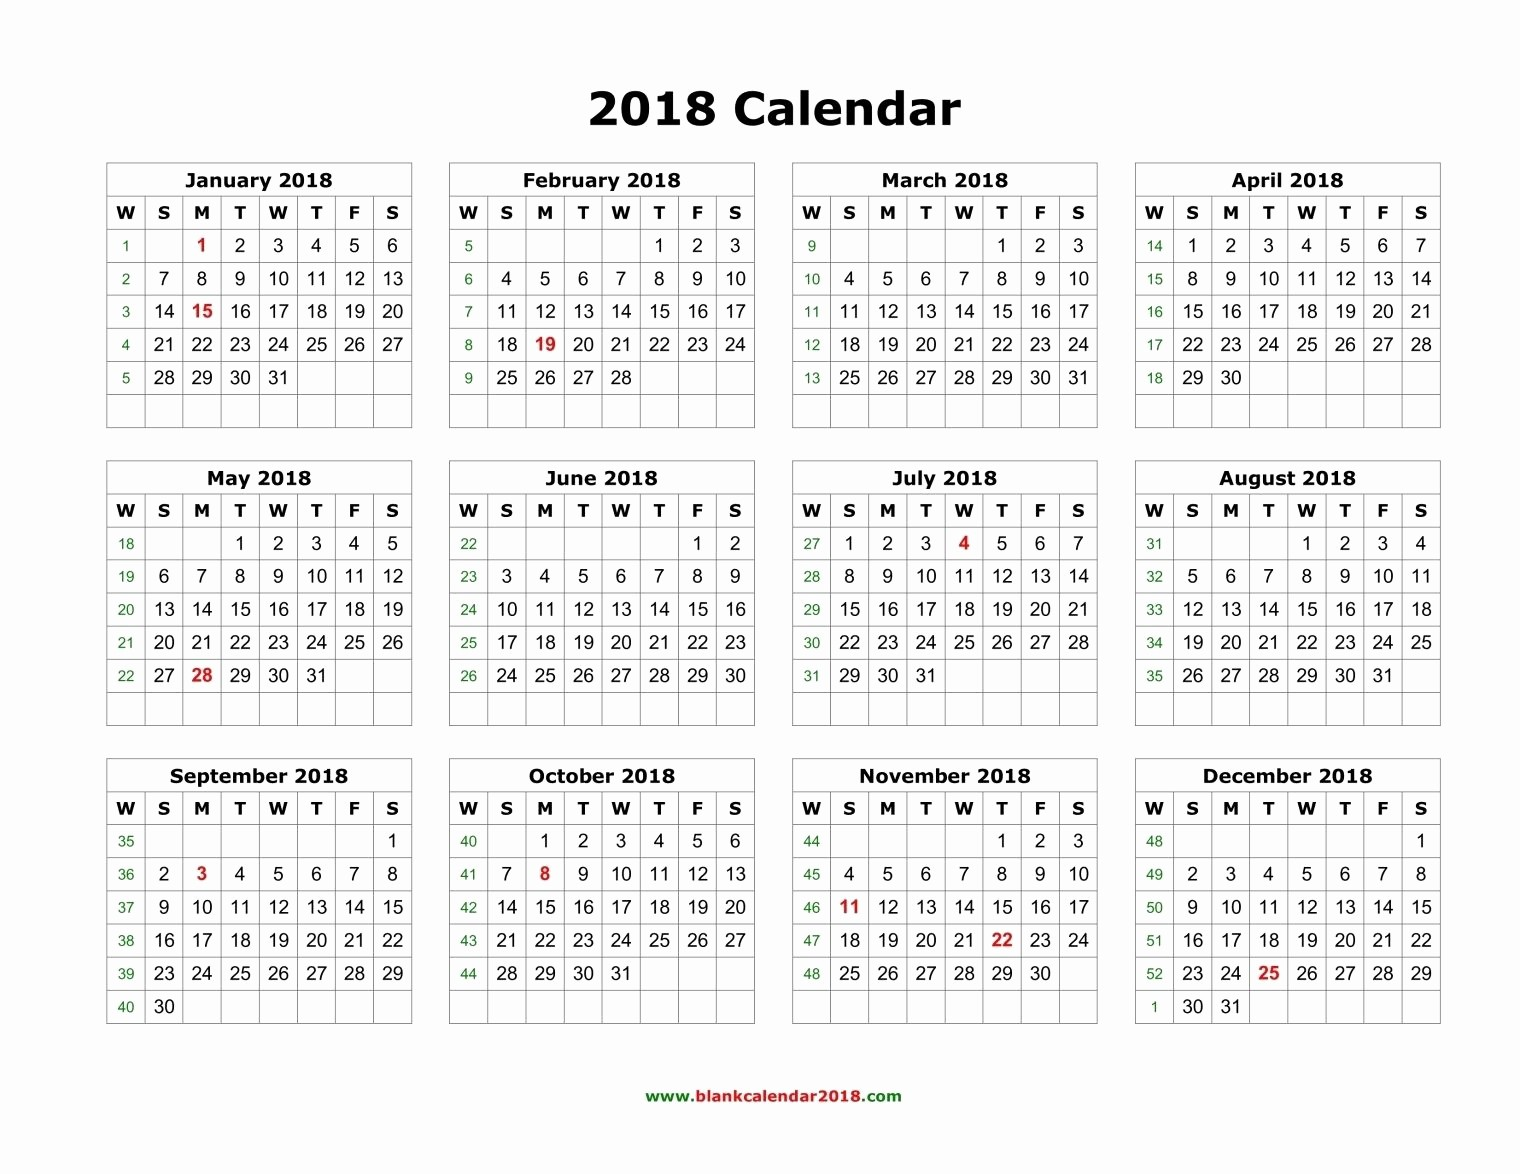 Free Printable Yearly Calendar 2018 Luxury 2018 Calendar Printable Yearly 2018 Calendar Blank